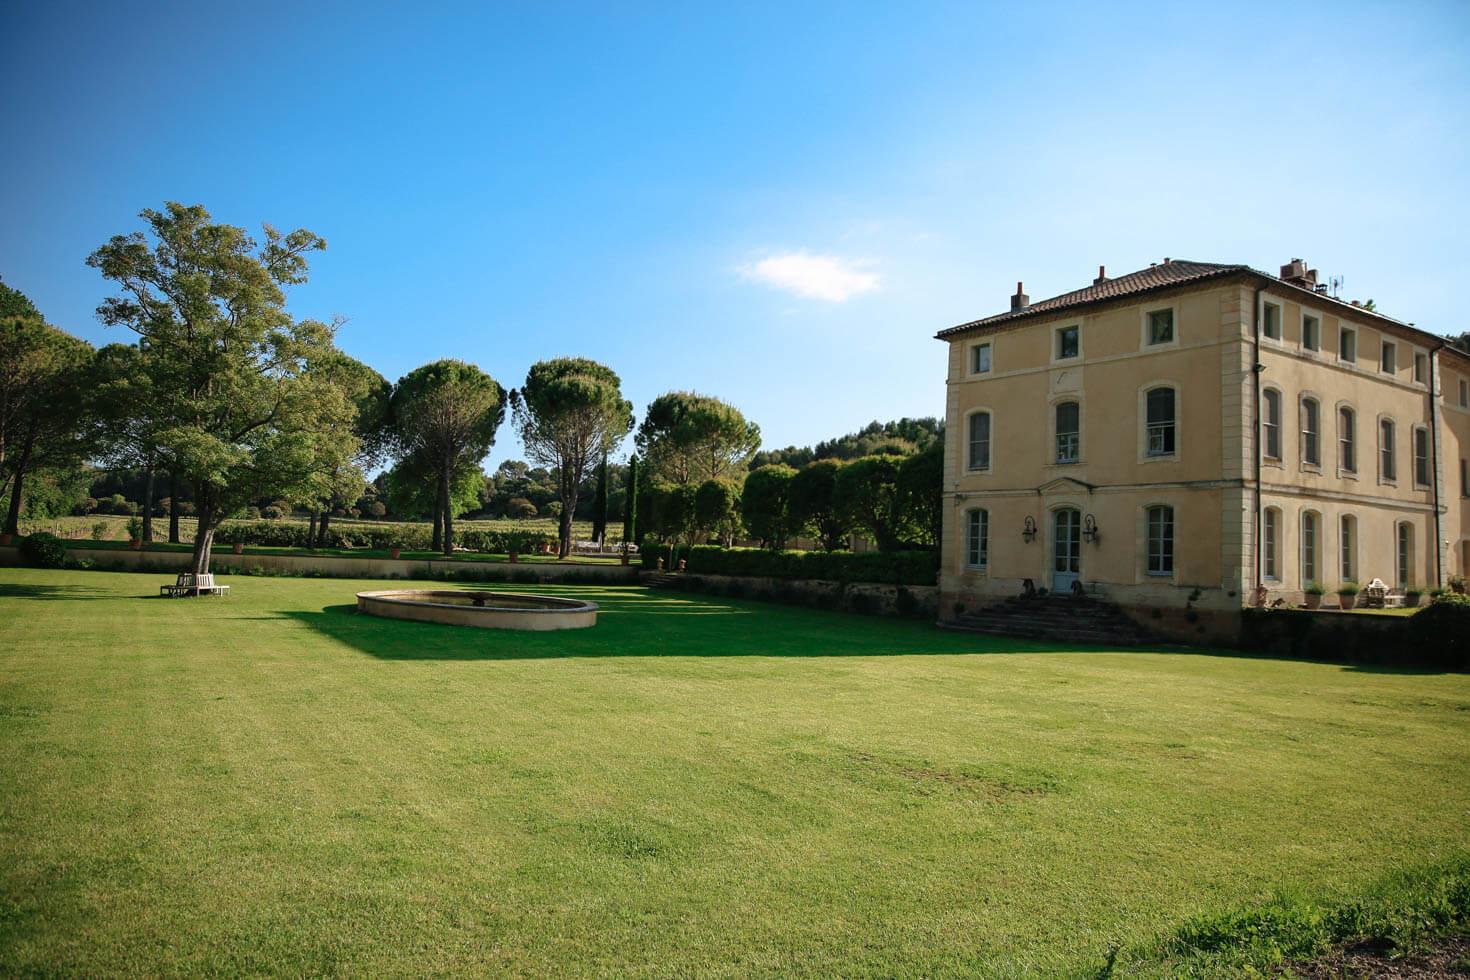 gifta sig i sodra frankrike Chateau Talaud-9